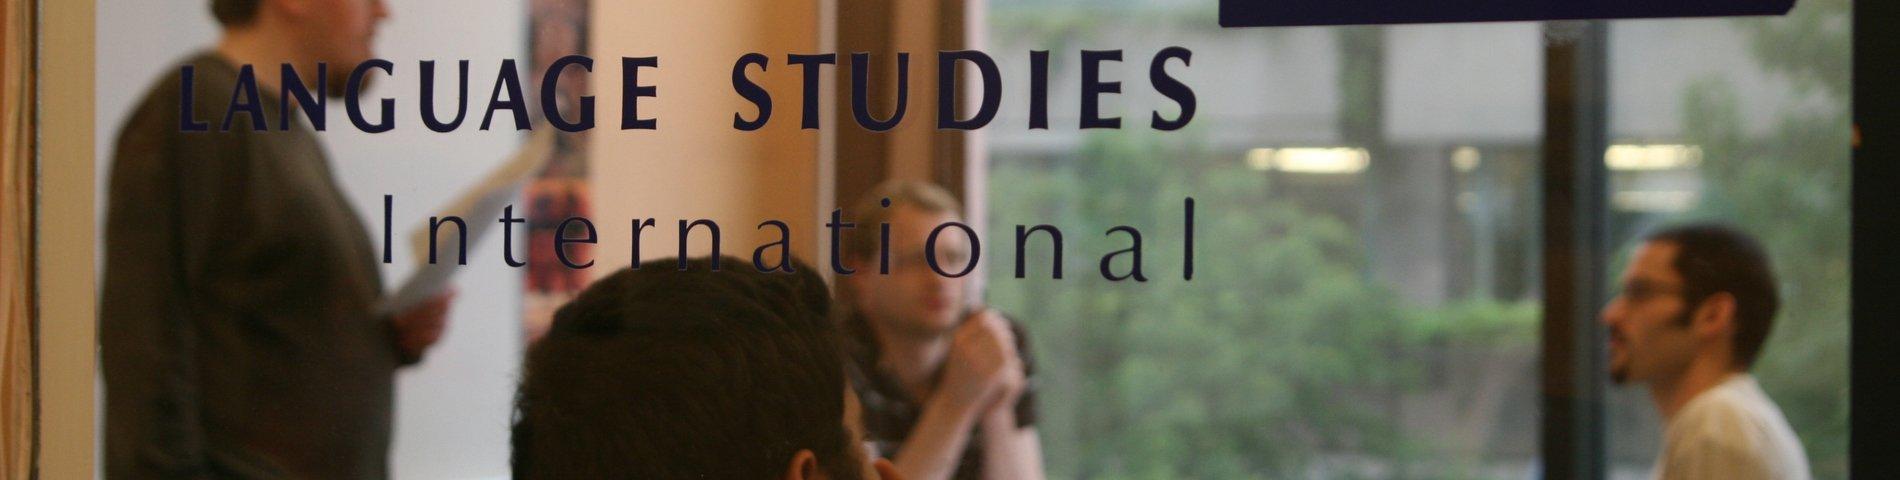 LSI - Language Studies International snímek 1